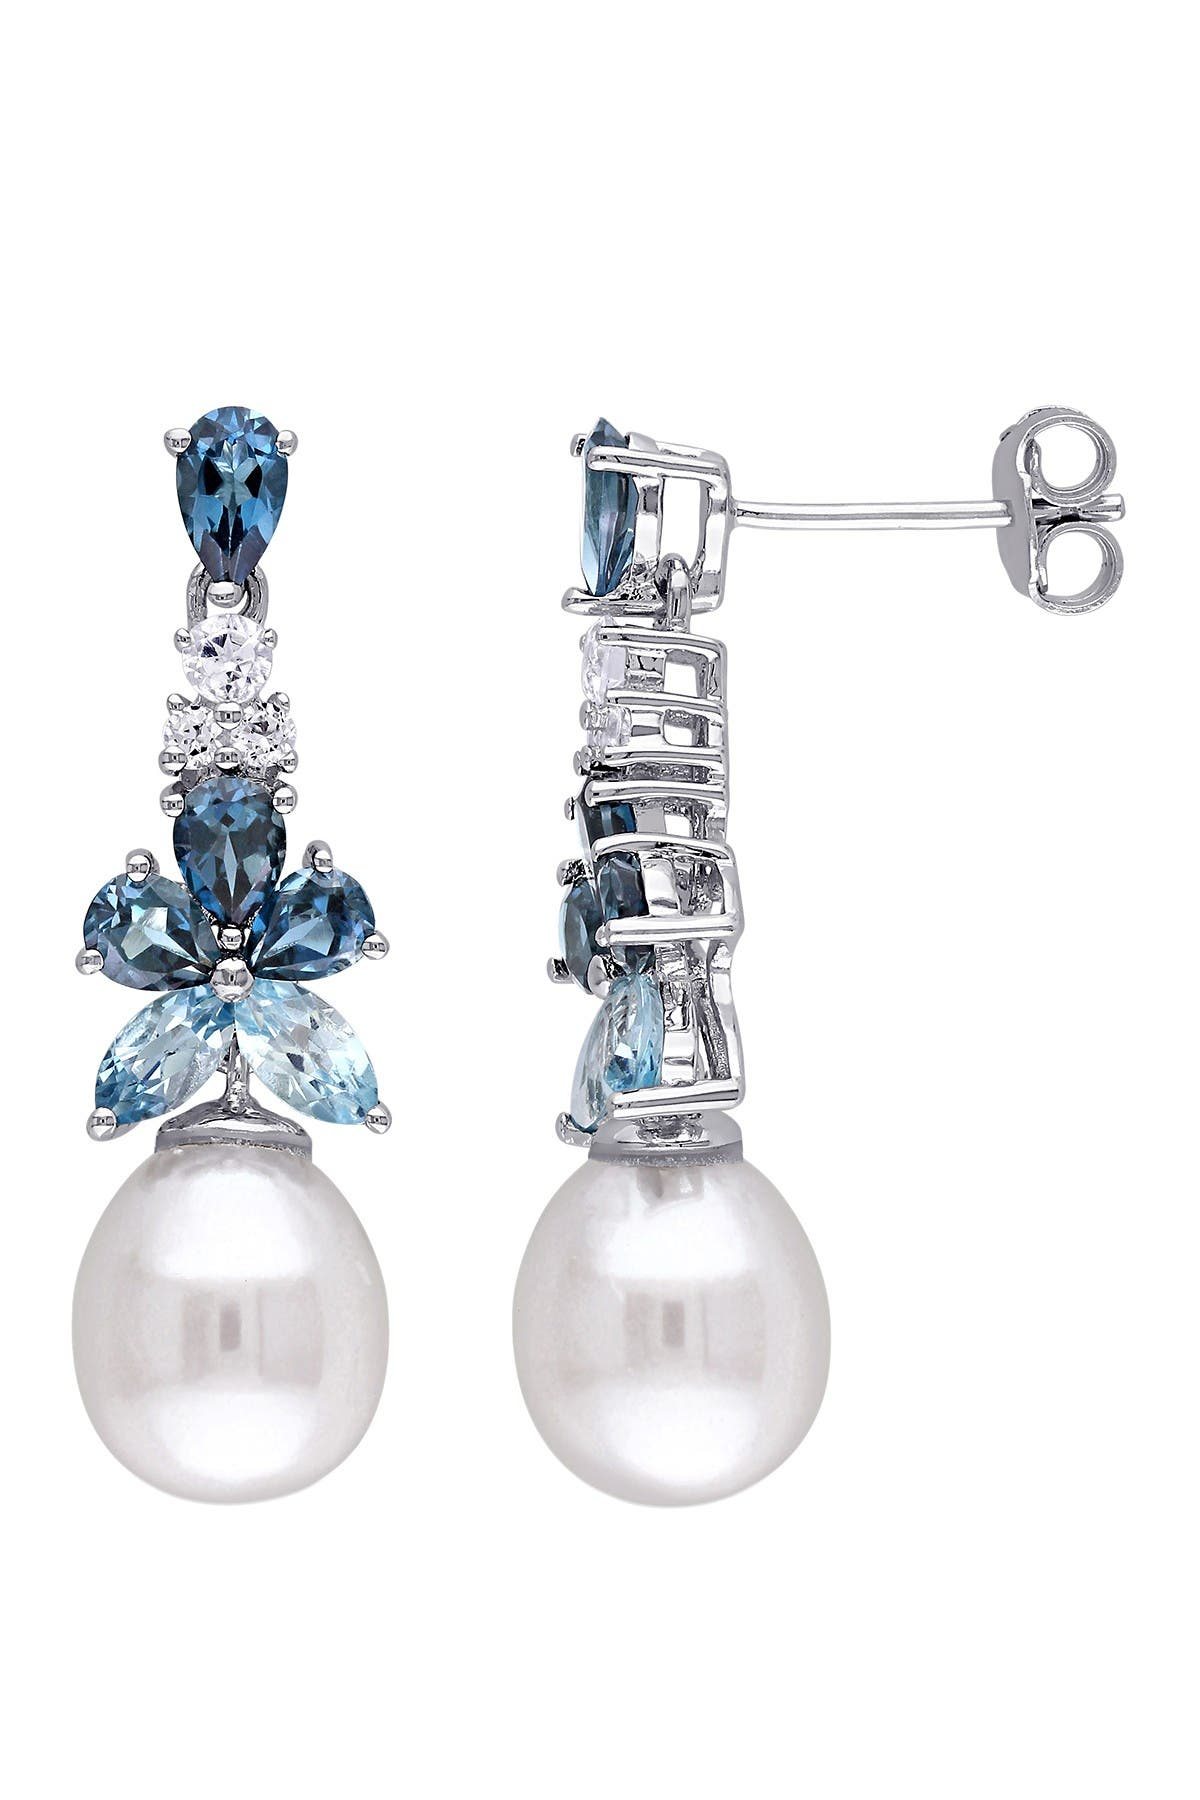 Image of Delmar Sterling Silver, Blue, White Topaz Sky & 8.5-9mm Freshwater Pearl Earrings